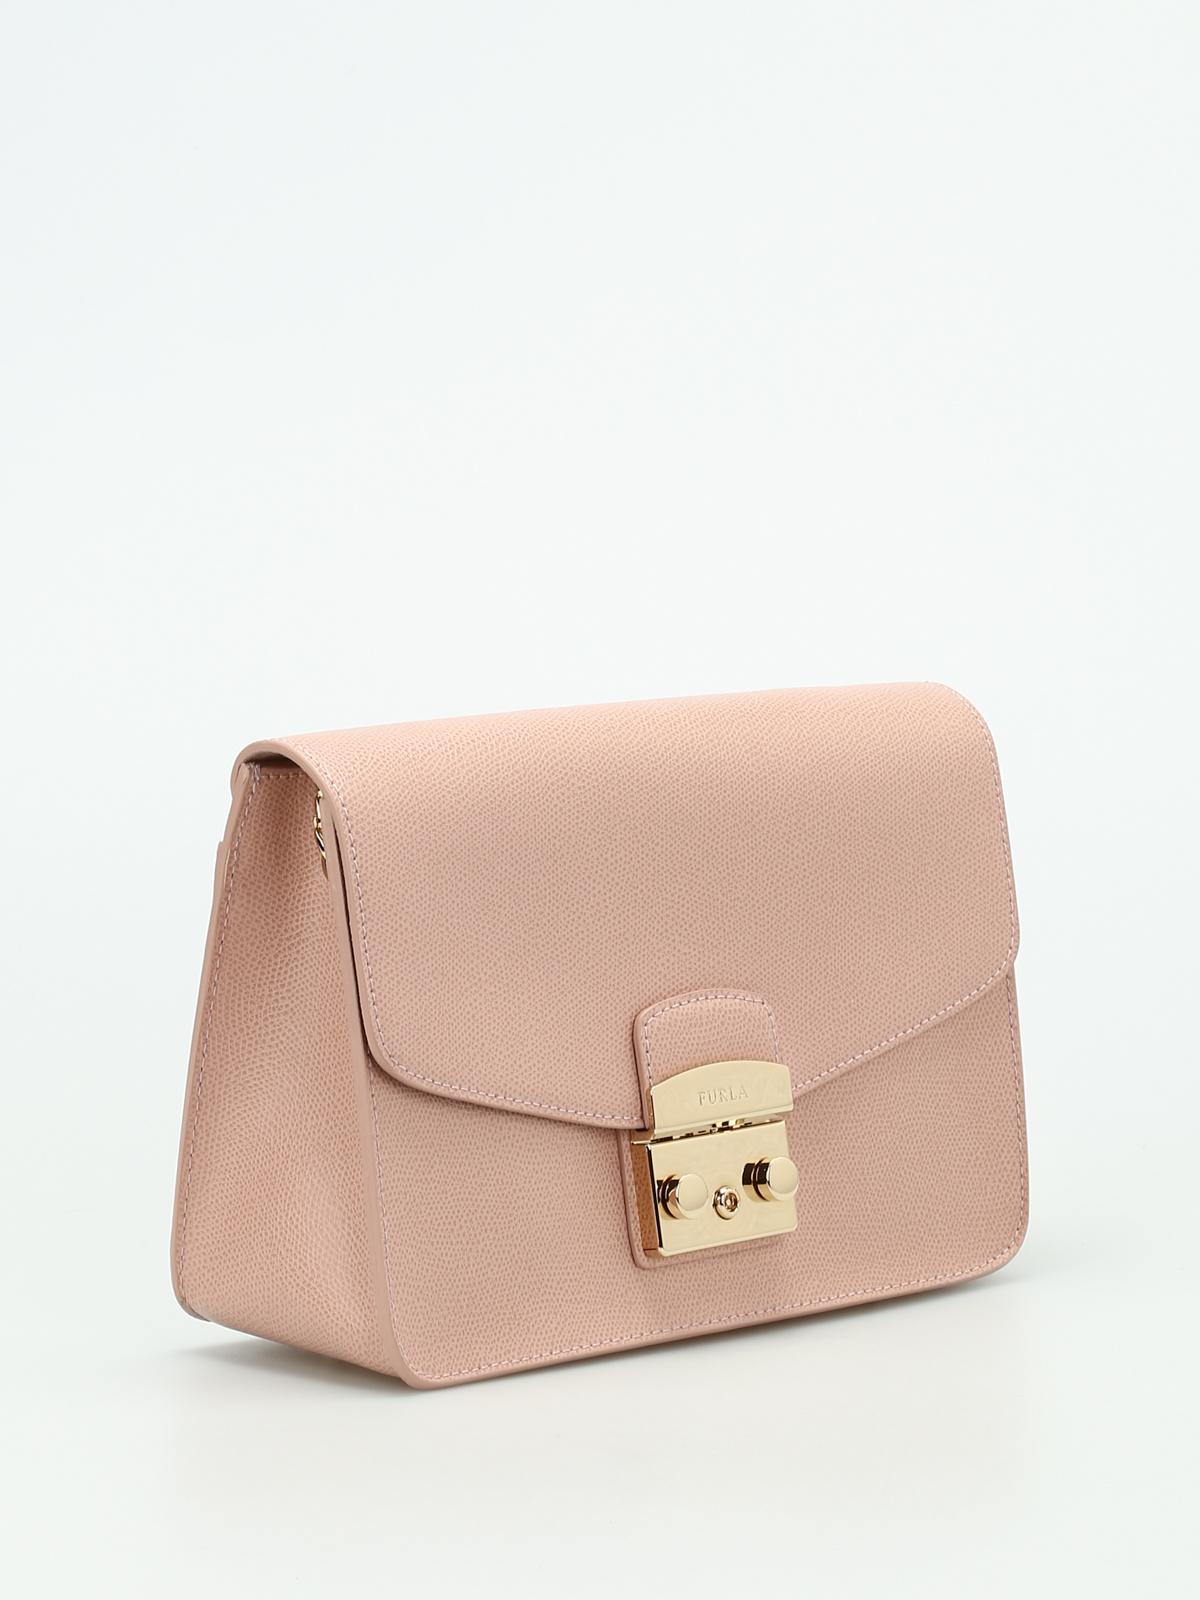 Furla Metropolis S leather shoulder bag ZJbE6kSwU